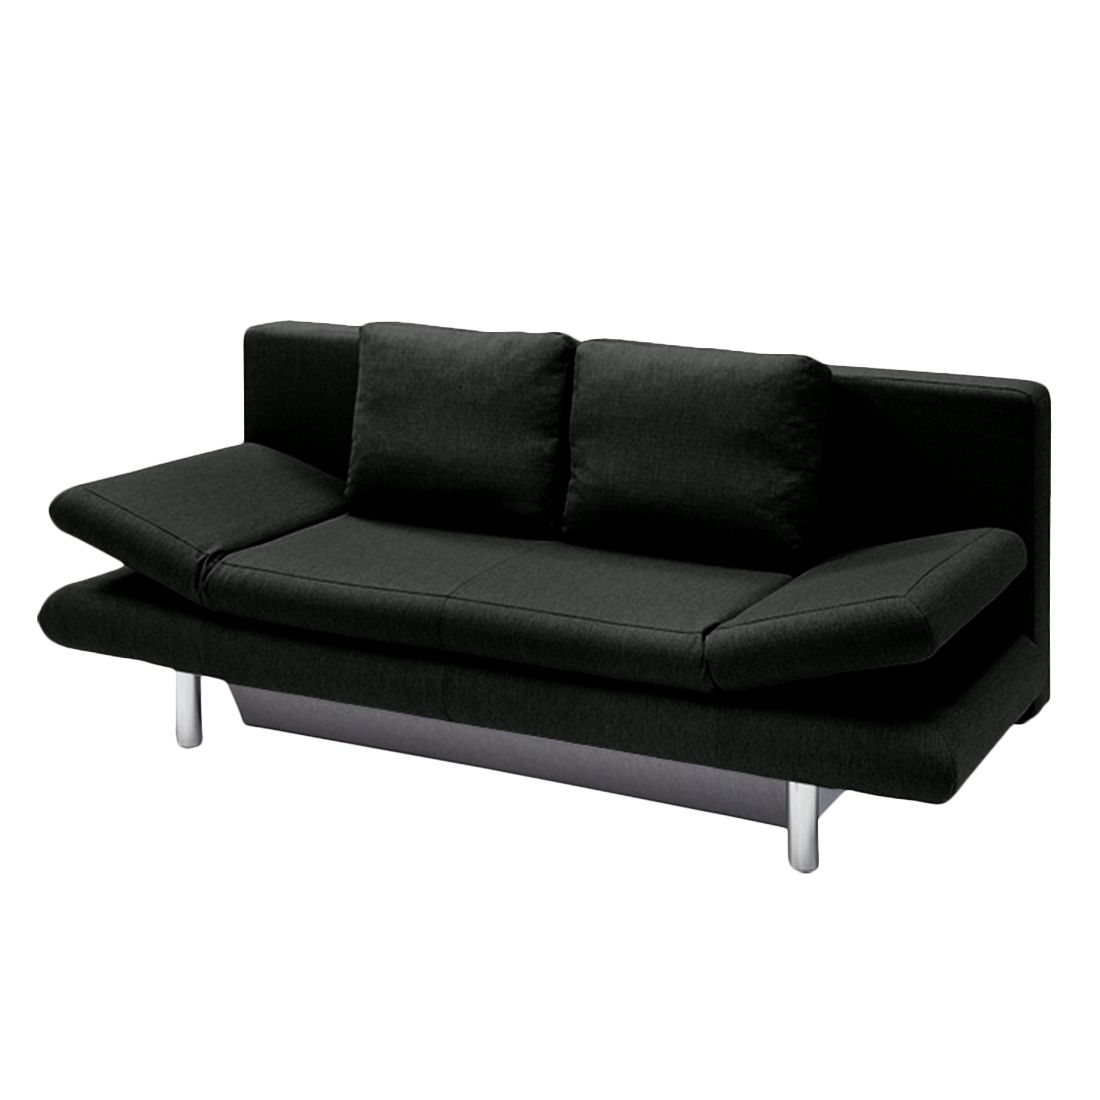 schlafsofa manoi webstoff schwarz studio monroe jetzt. Black Bedroom Furniture Sets. Home Design Ideas